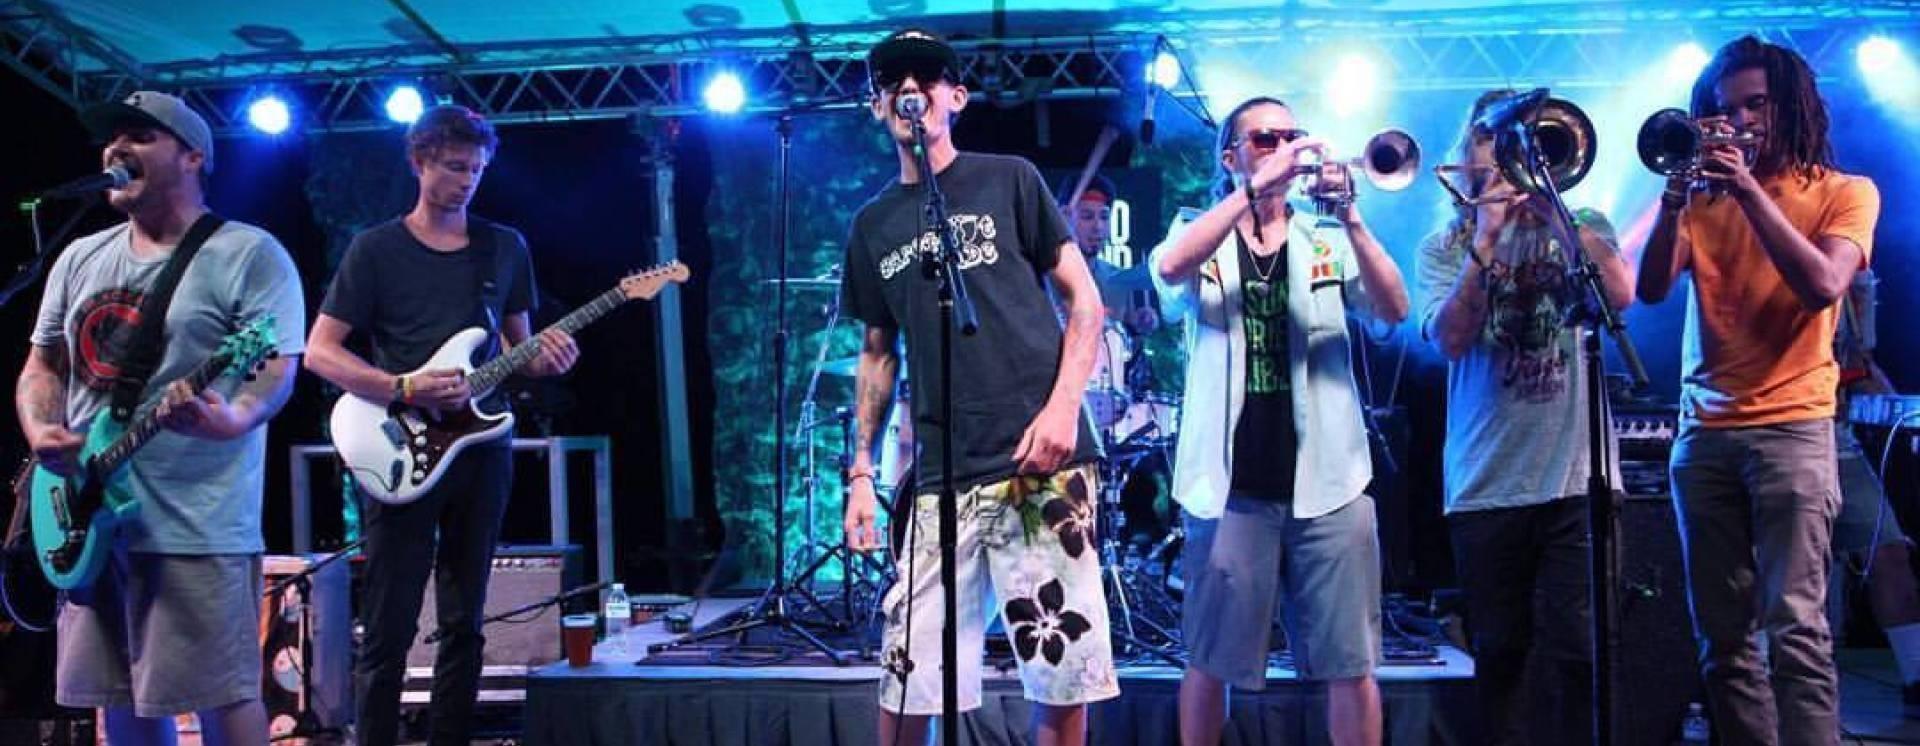 Williamsburg Virginia Live Music Finder Trevor Daniel & The ReeF